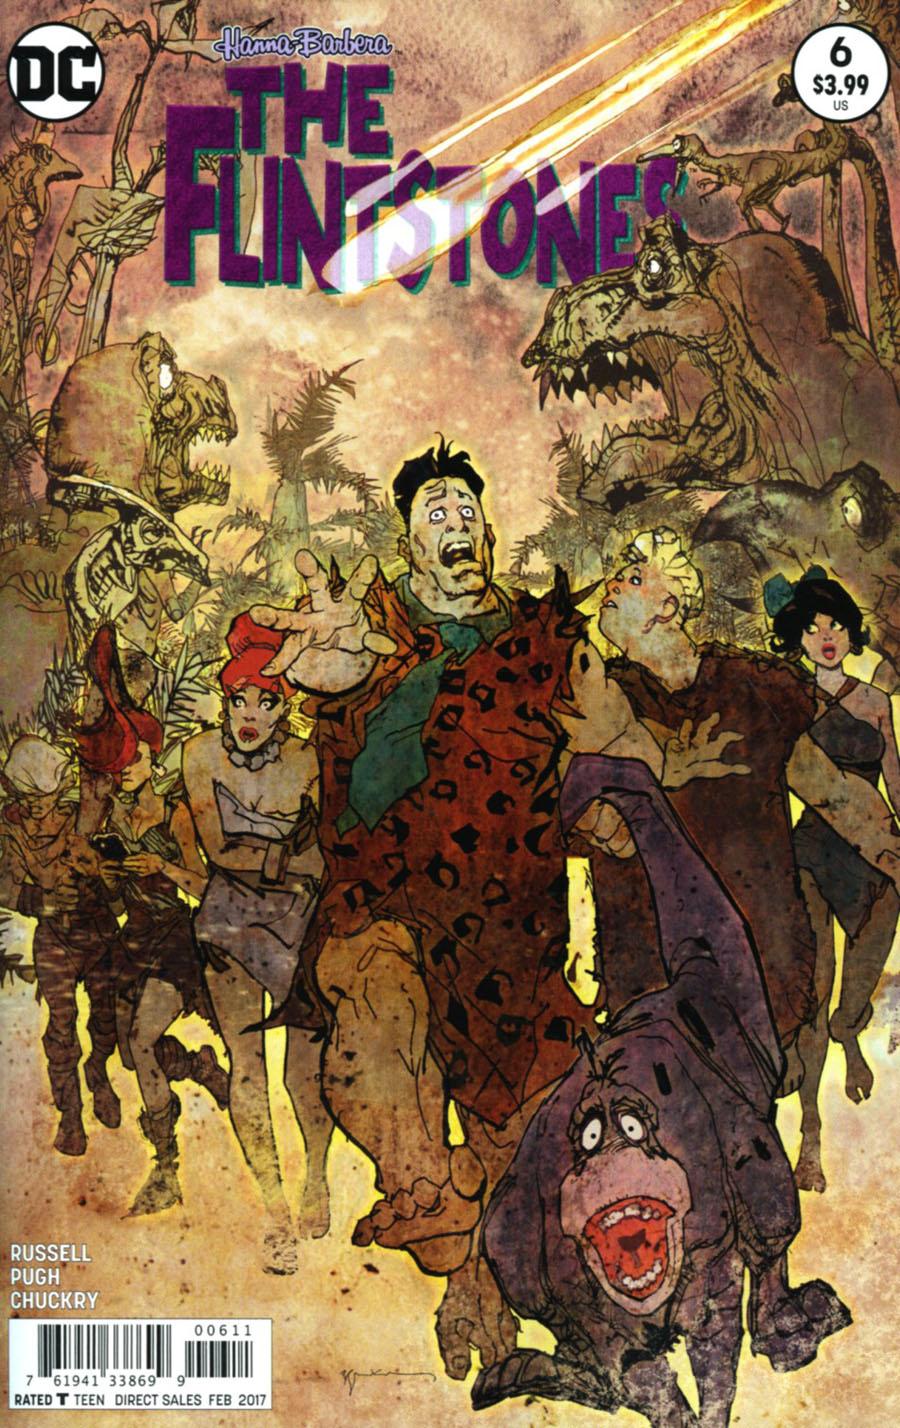 Flintstones (DC) #6 Cover A Regular Bill Sienkiewicz Cover